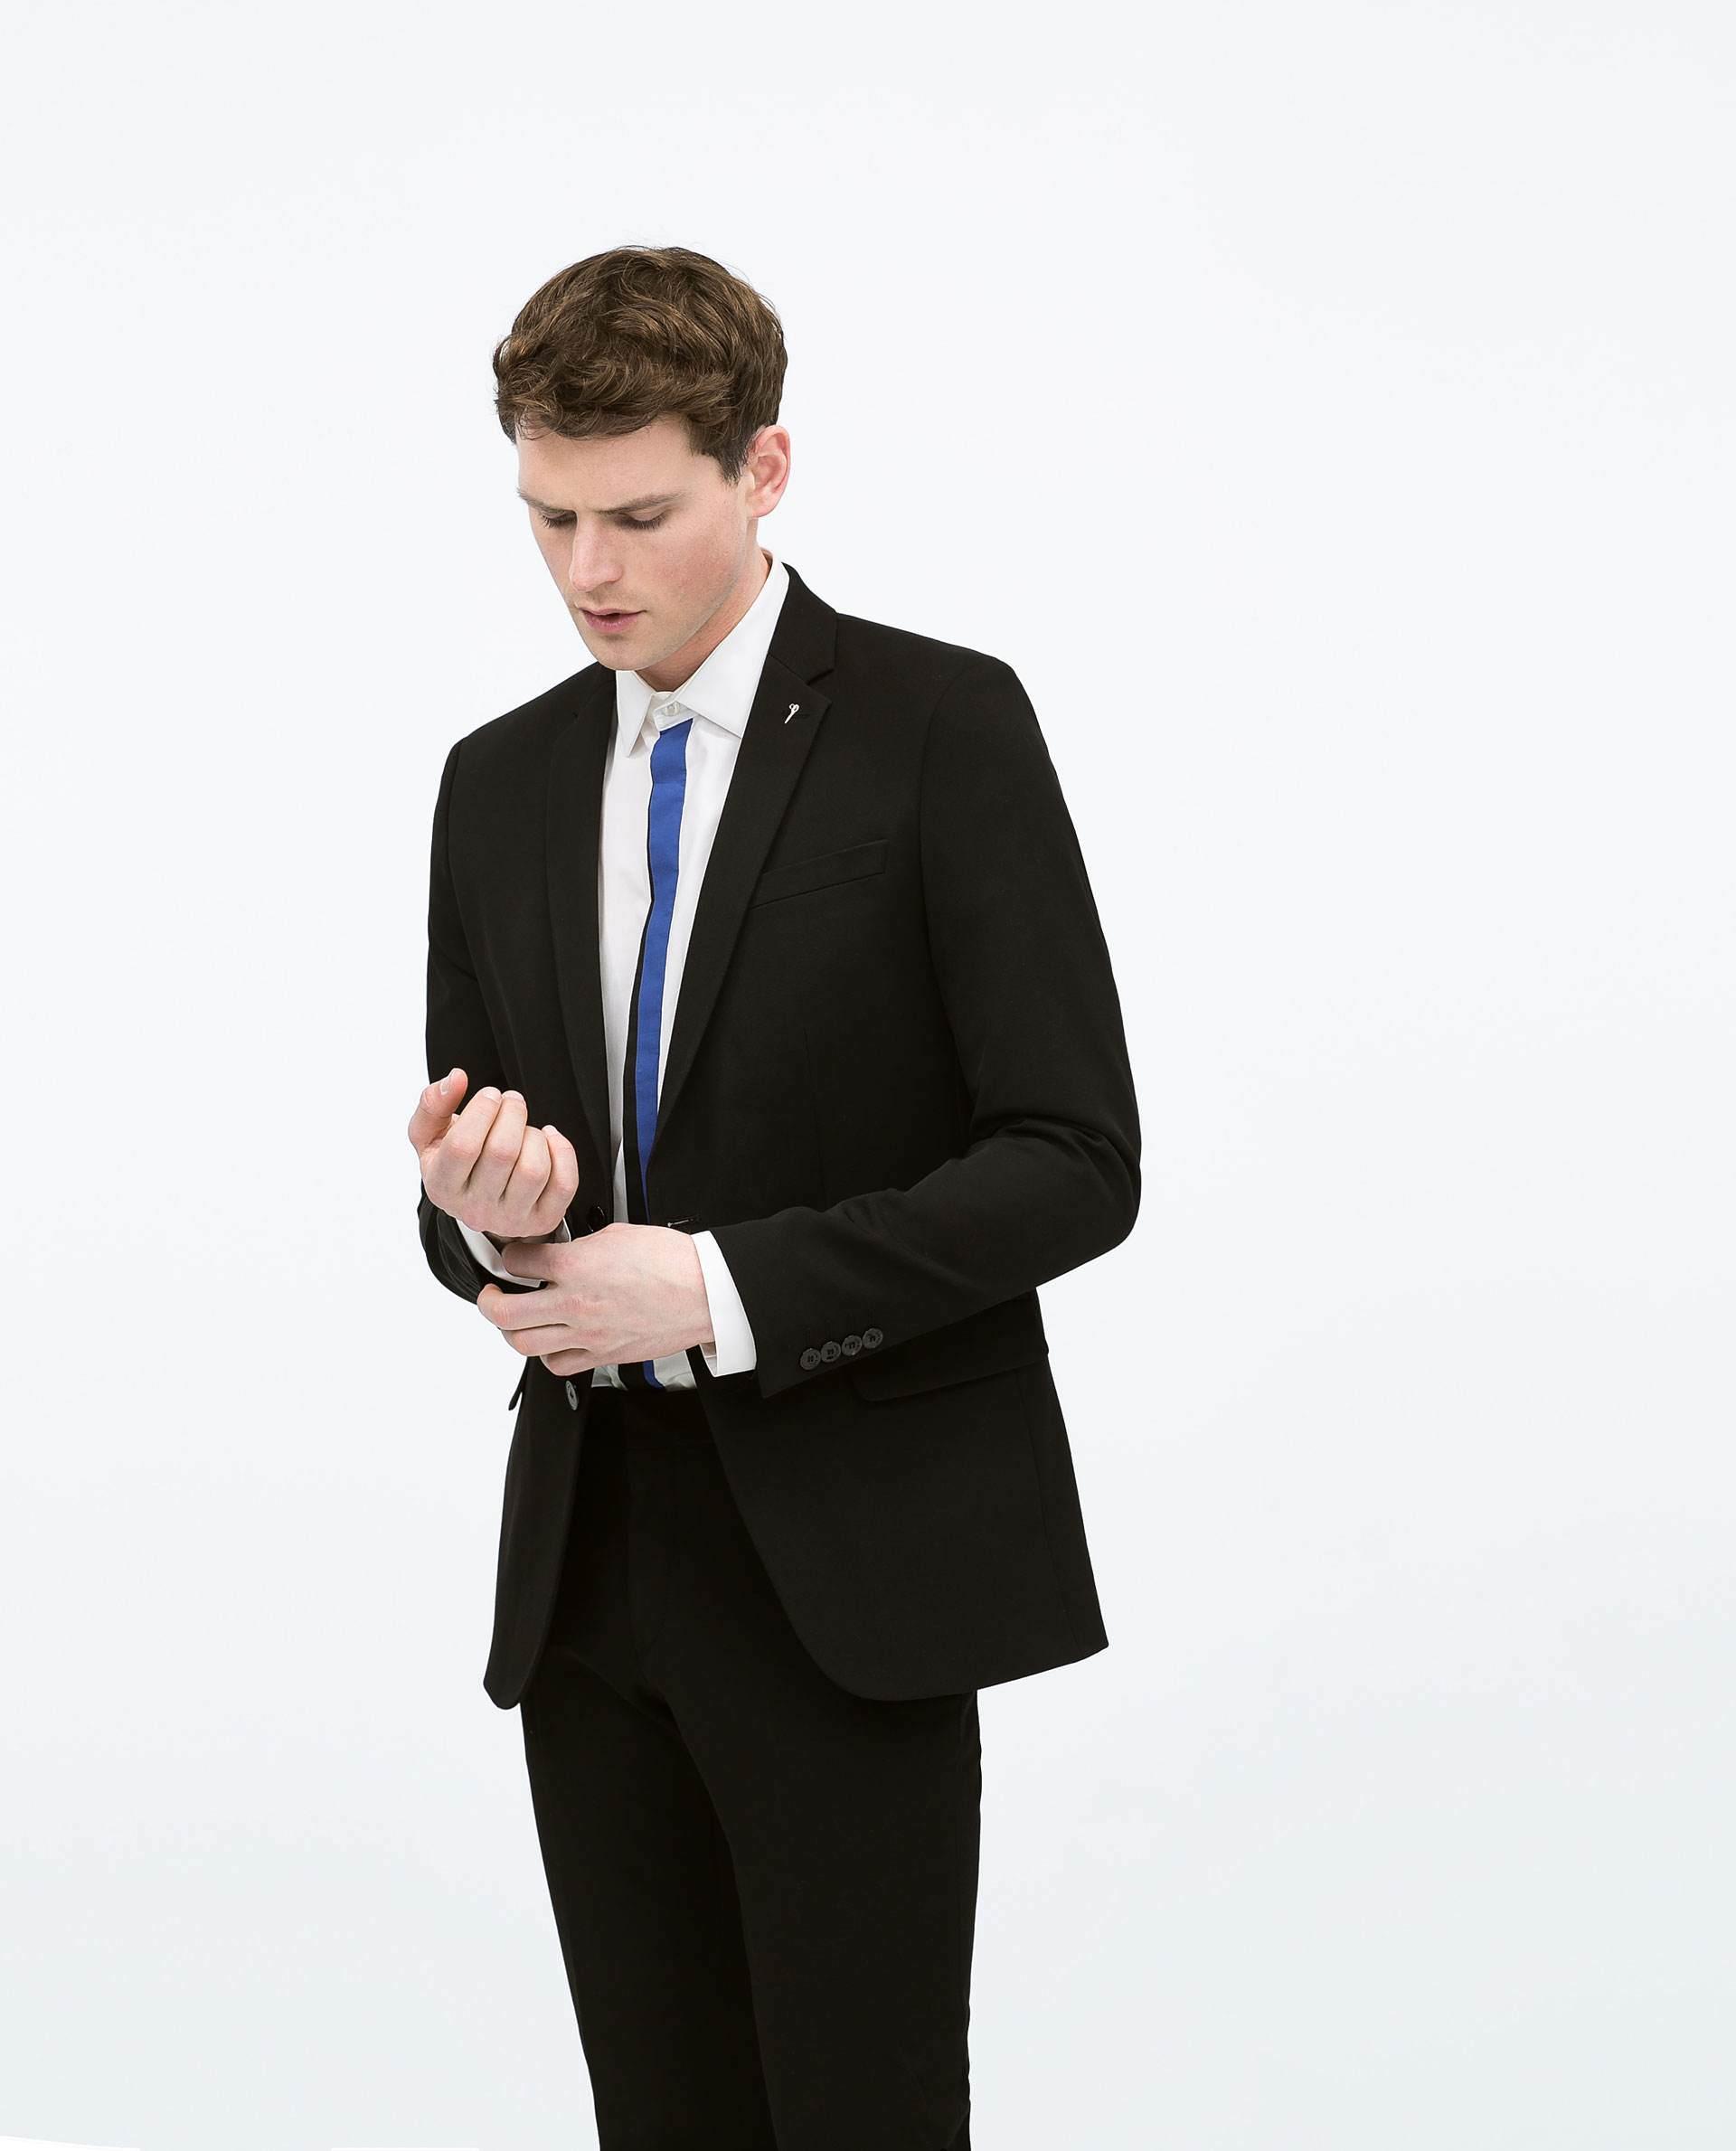 2017 New Tailored Men′s Wedding Dress Suit (BCS038)